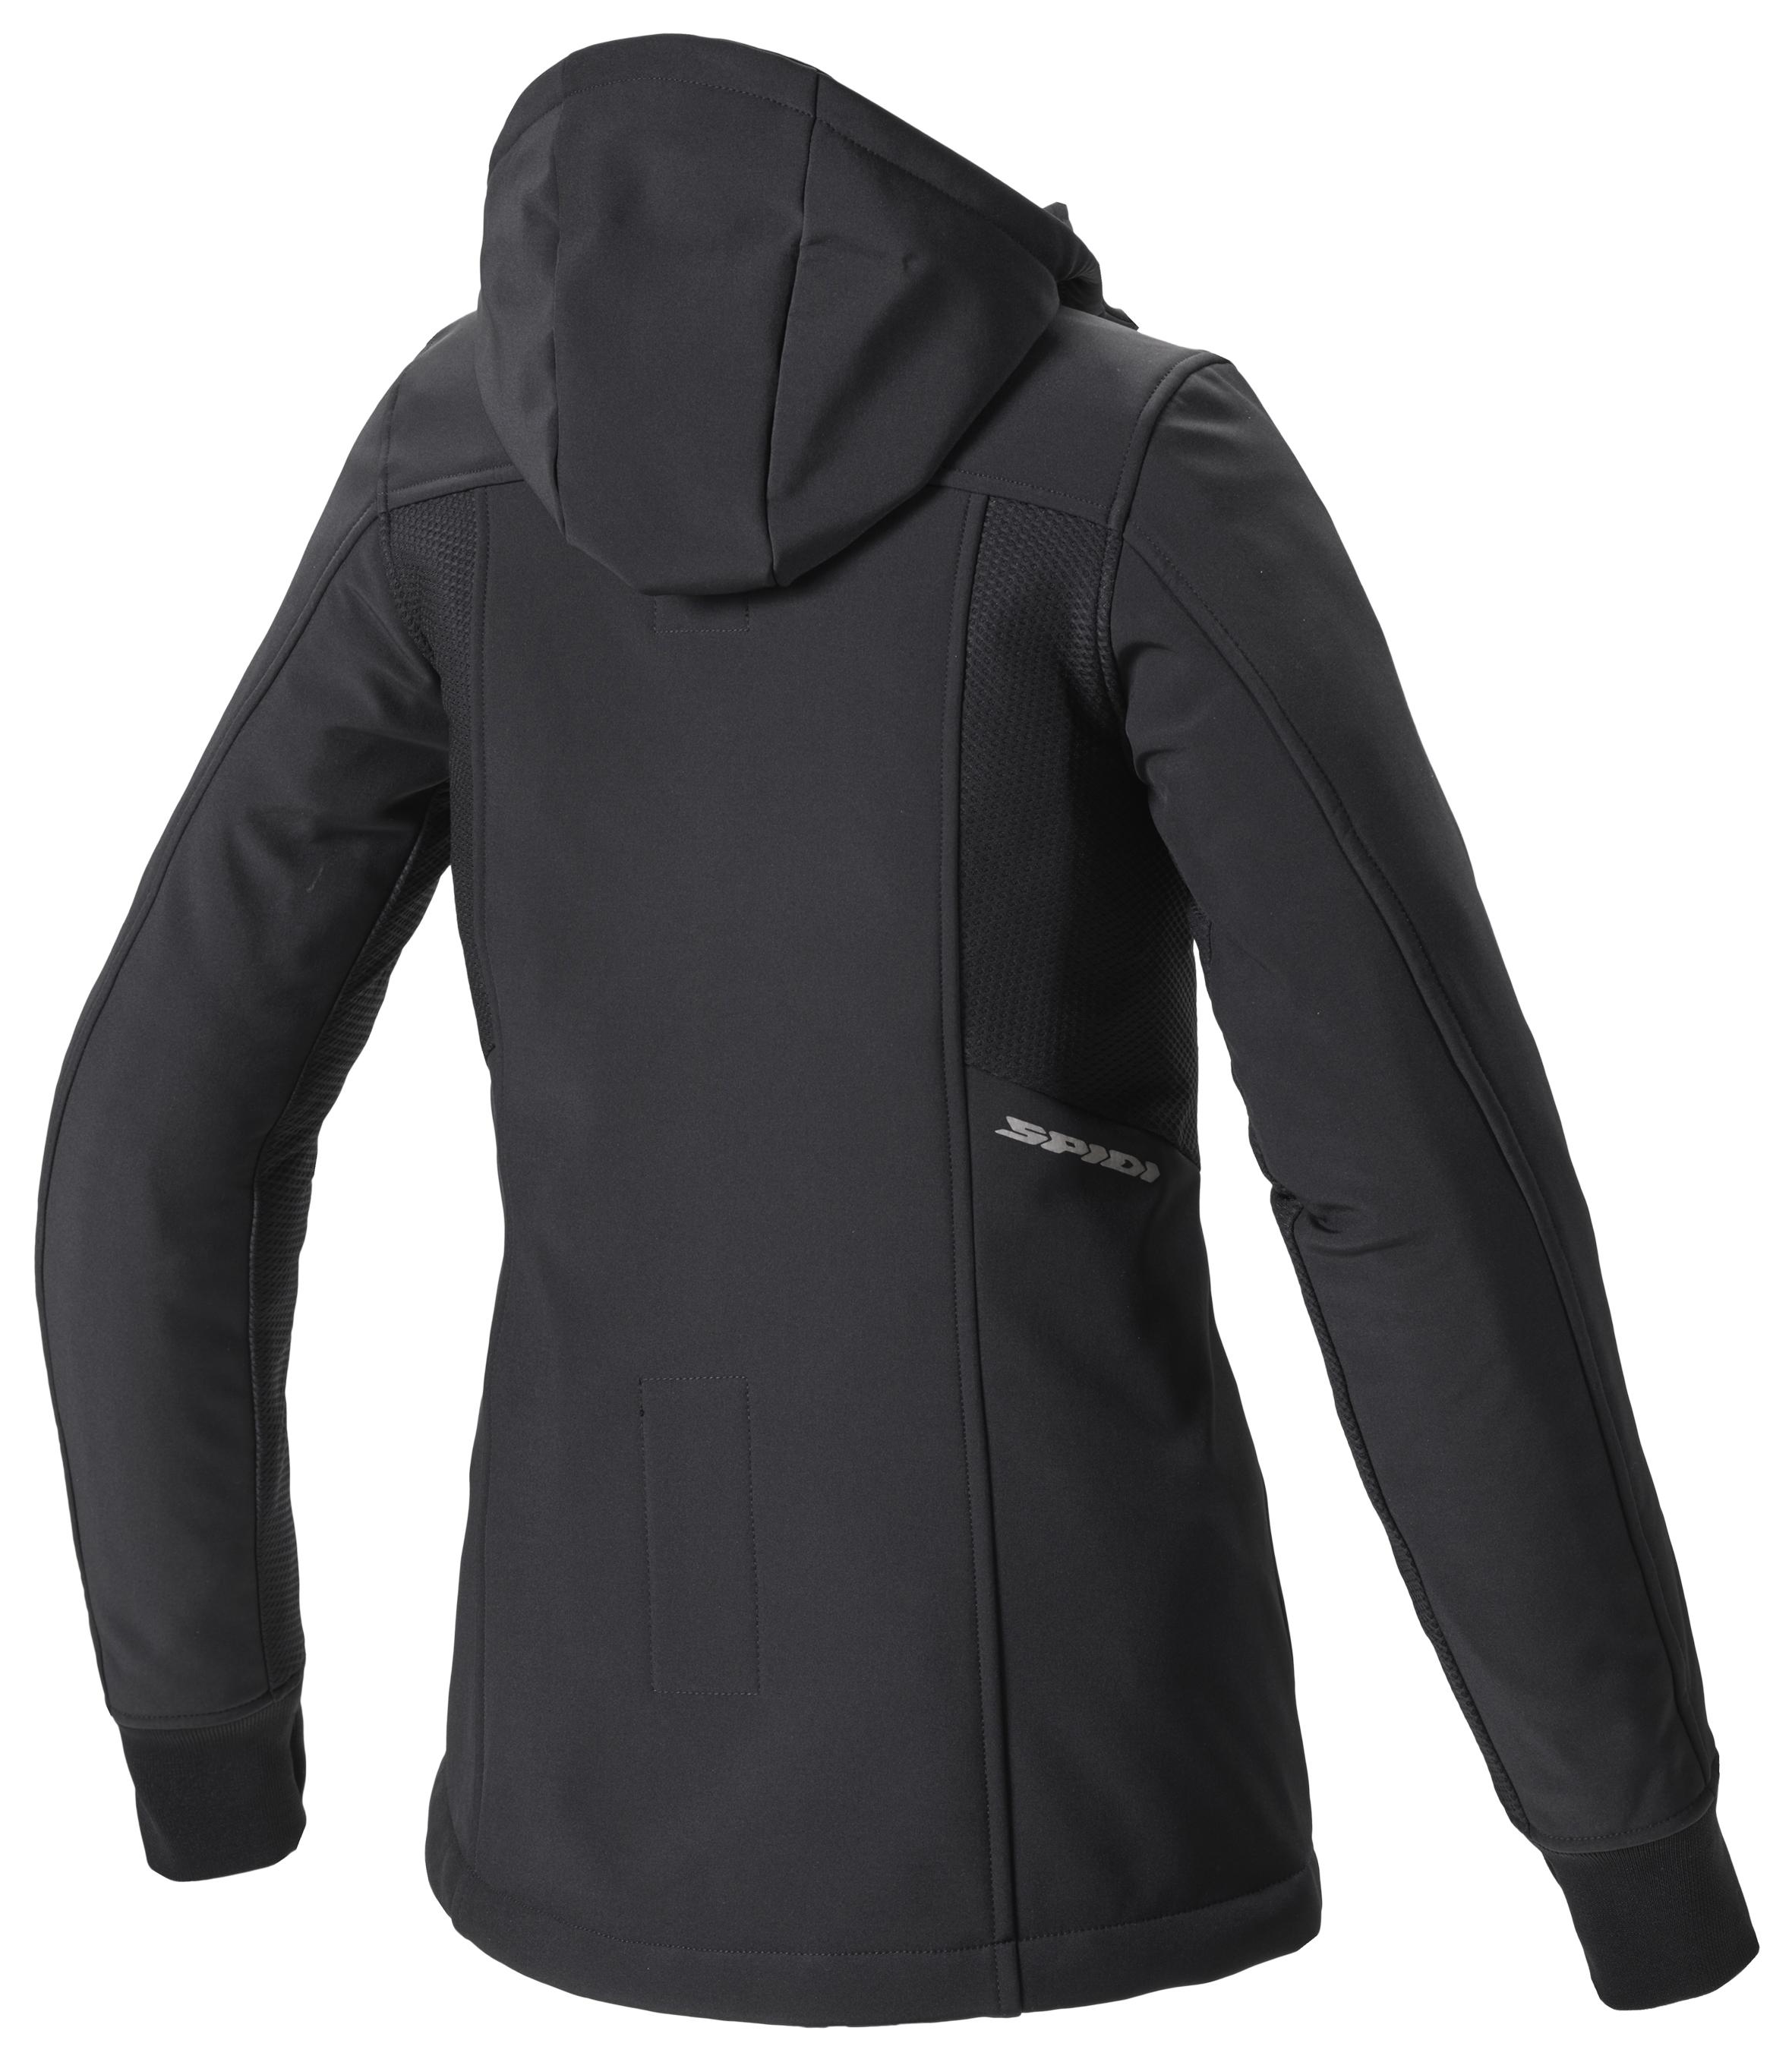 Spidi Hoodie Armor Women s Jacket - RevZilla c1884d7b0c